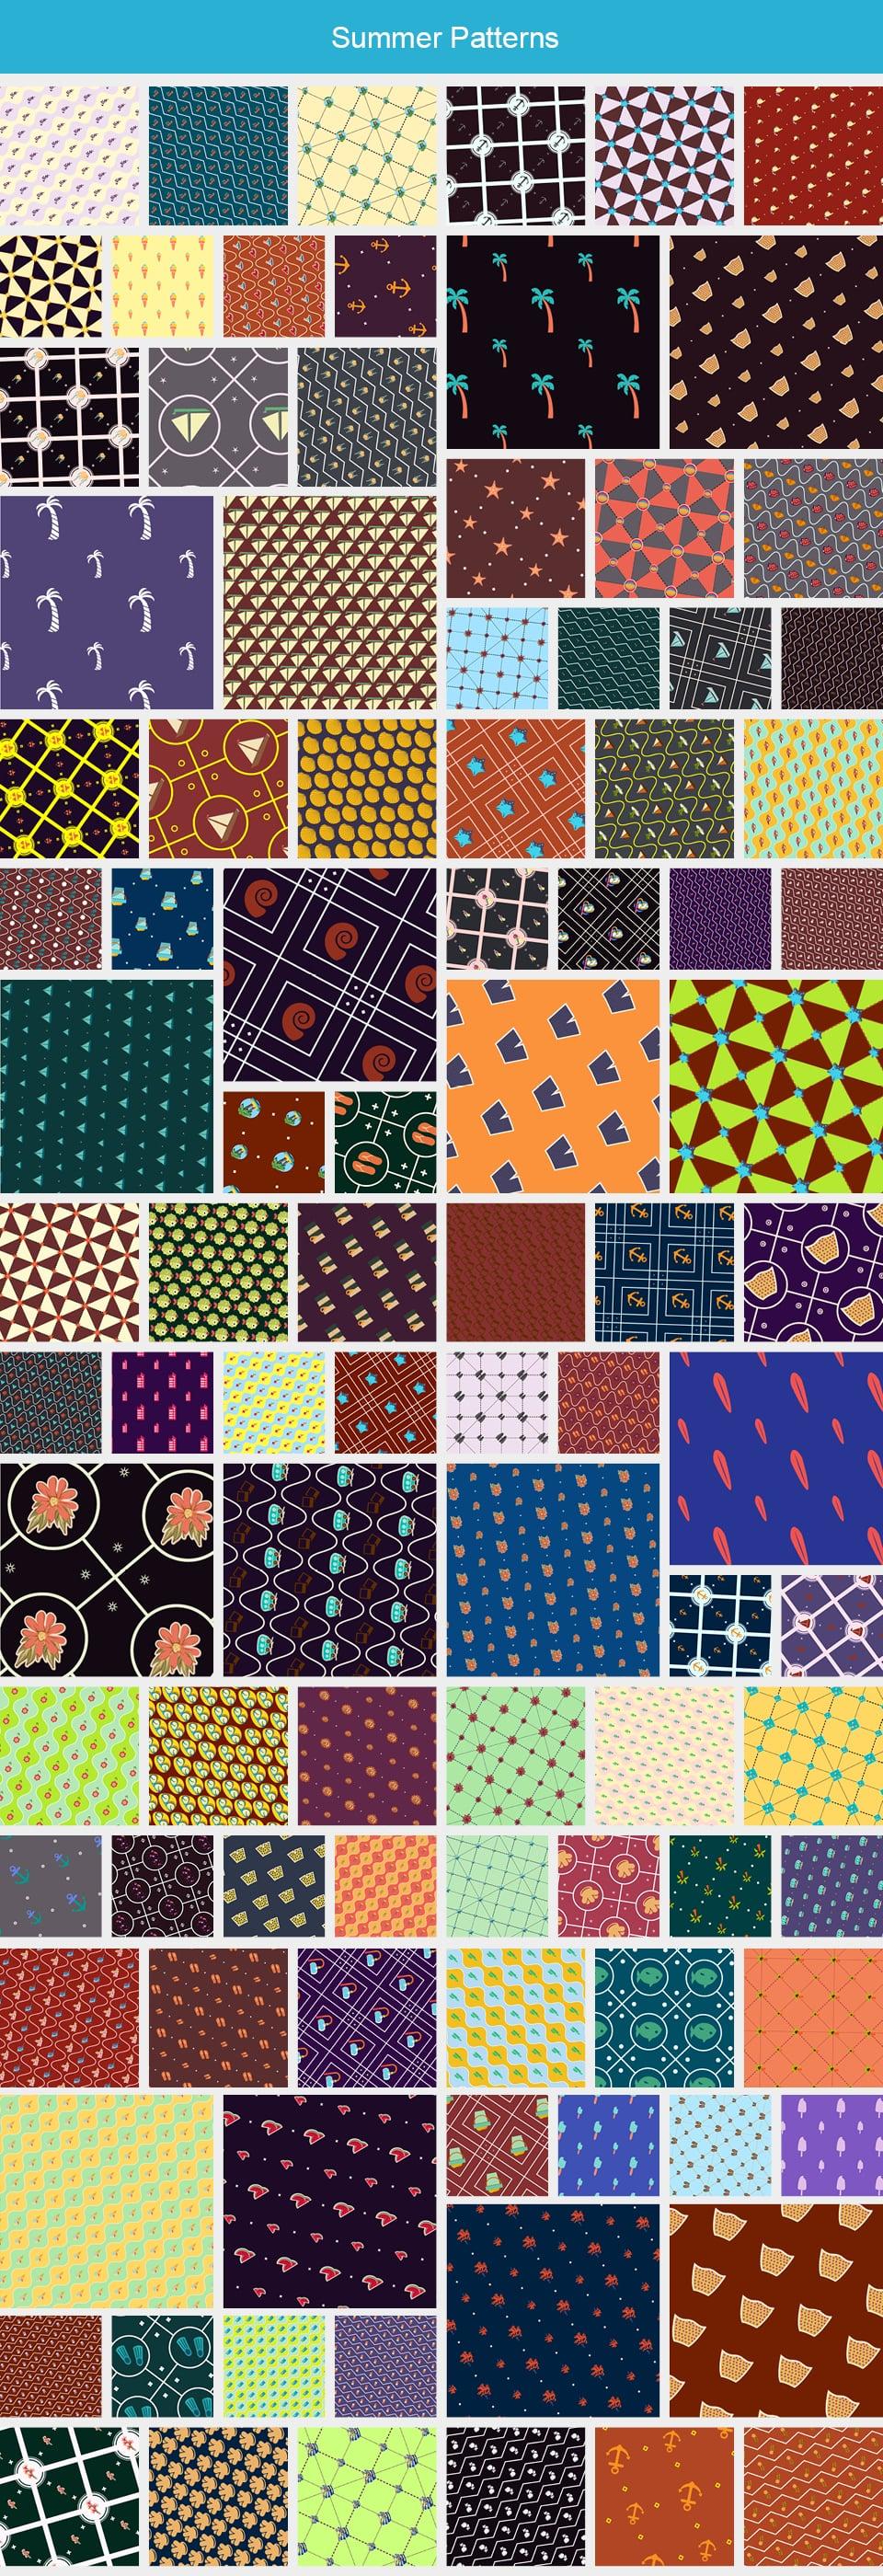 Modern Pattern Designs - Mega Bundle with 2000 Patterns - Large Preview Summer